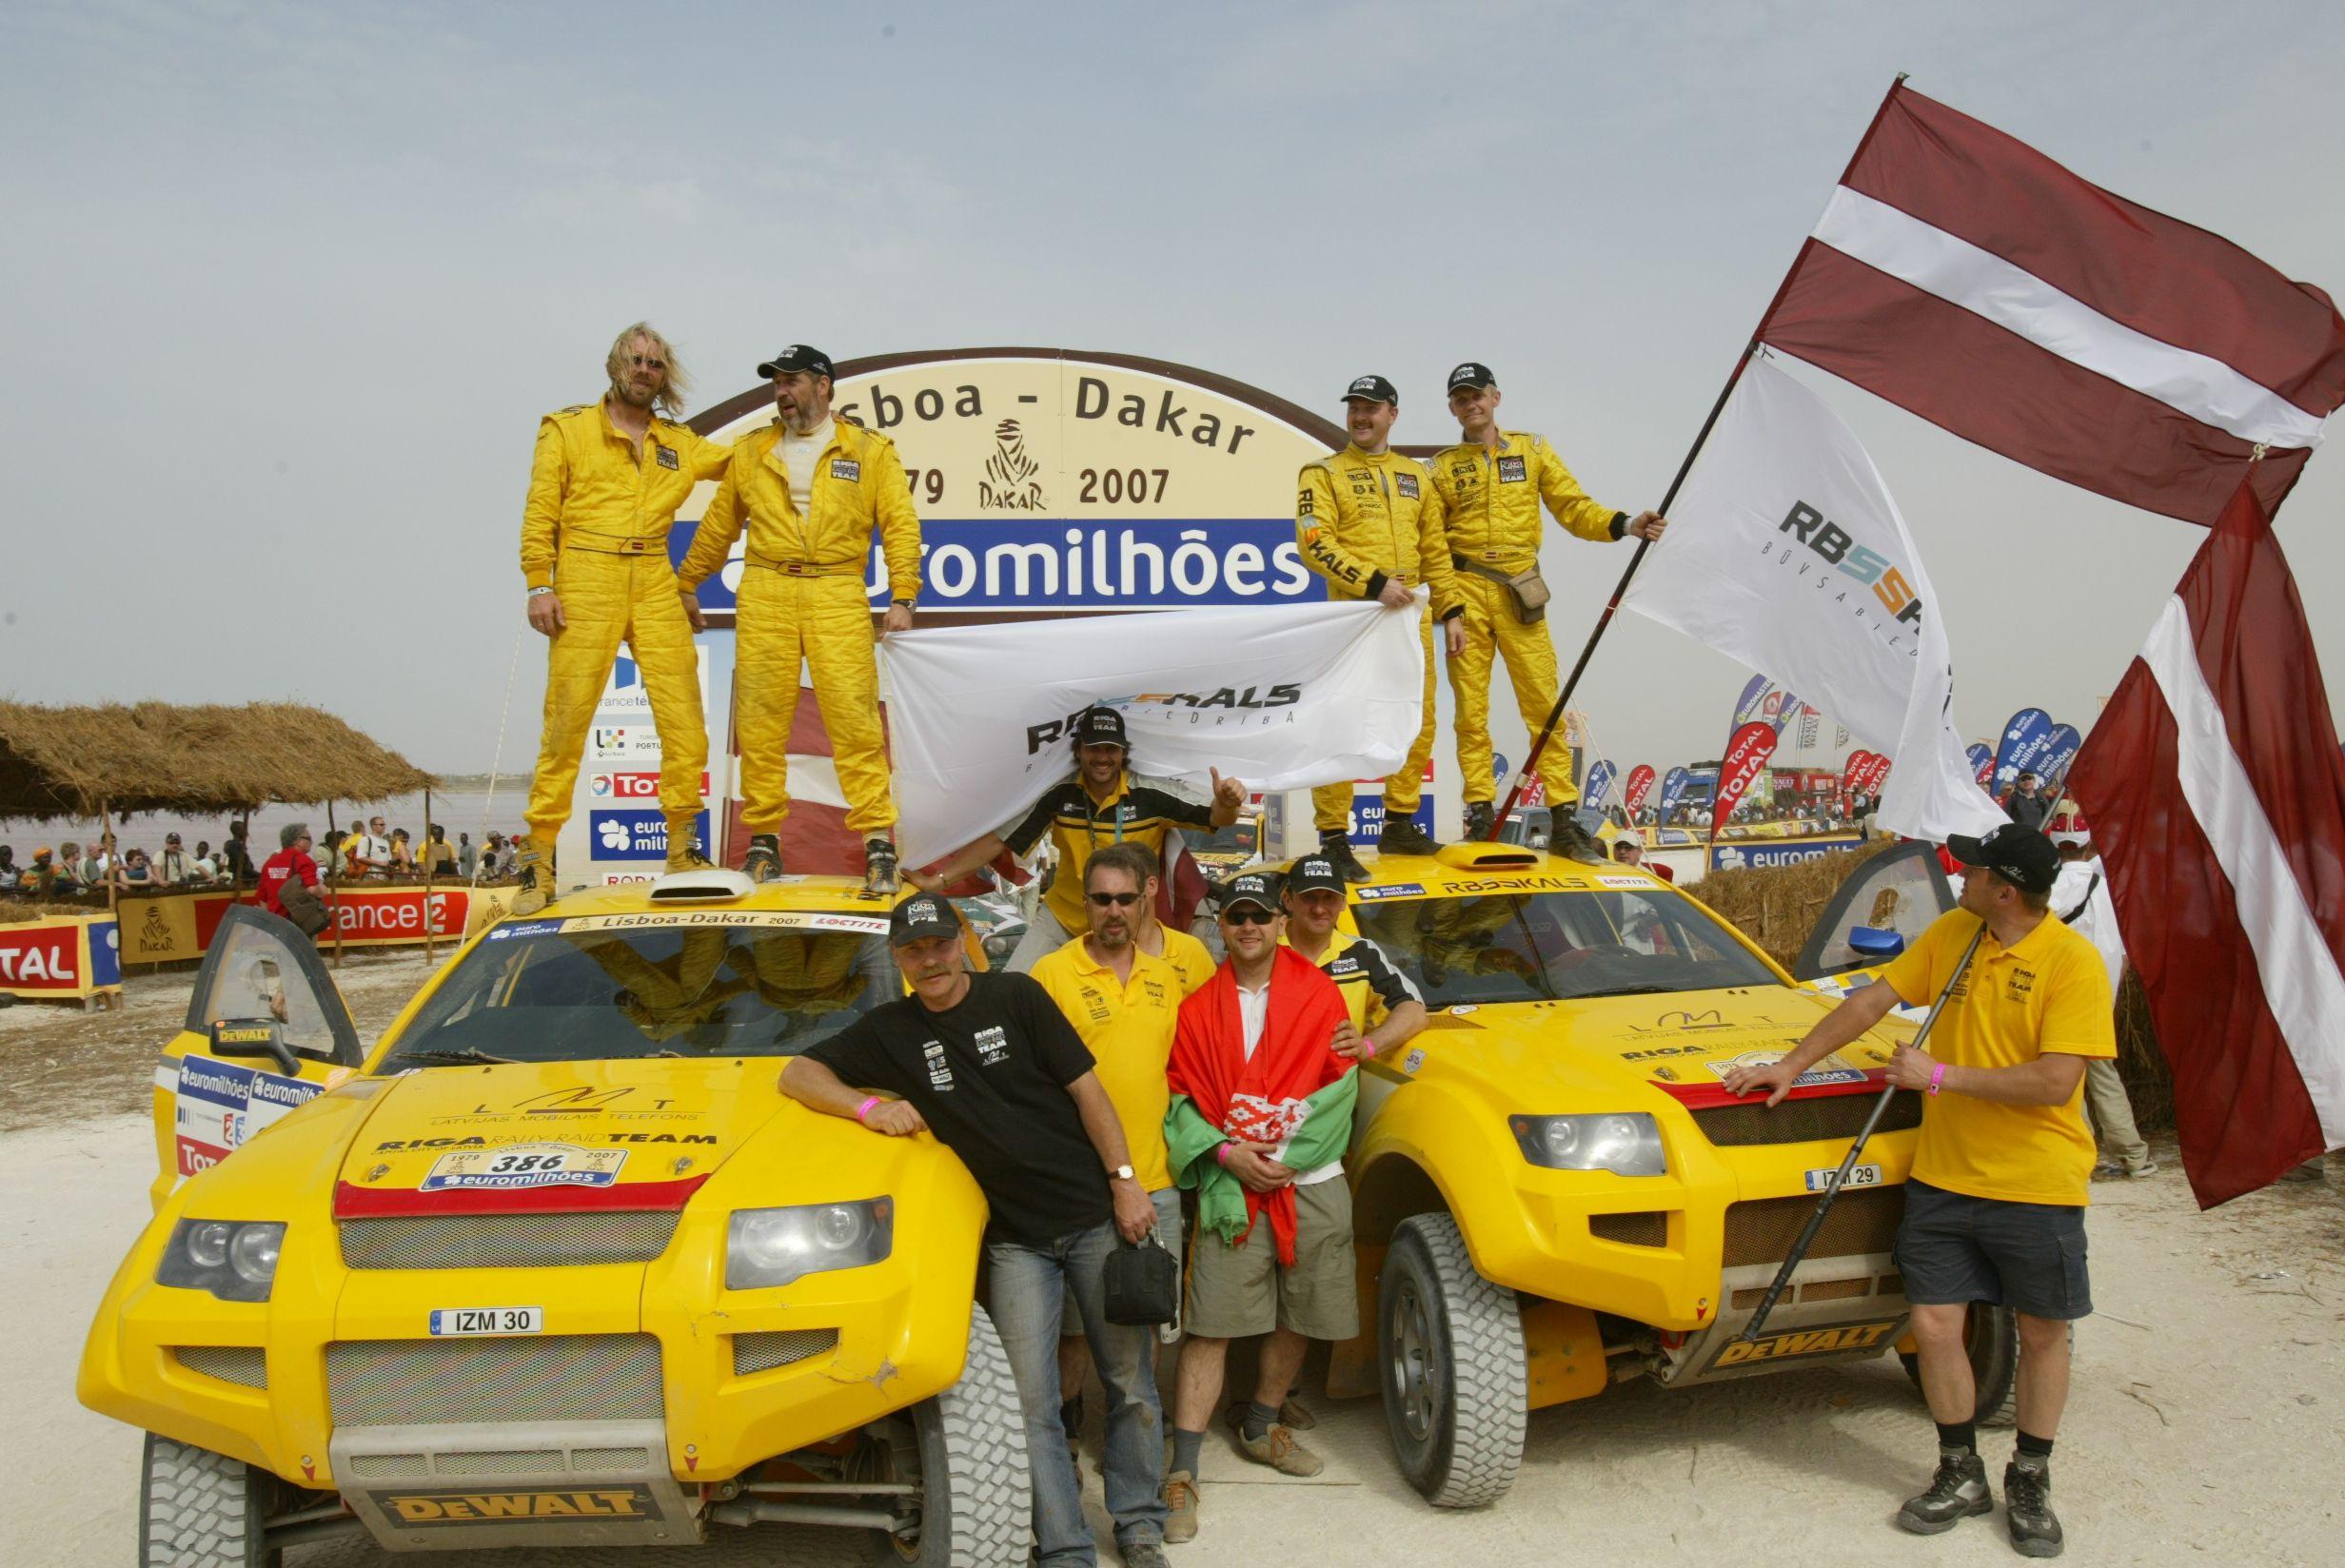 Rīga RallyRaid Team at the finish of Dakar 2007